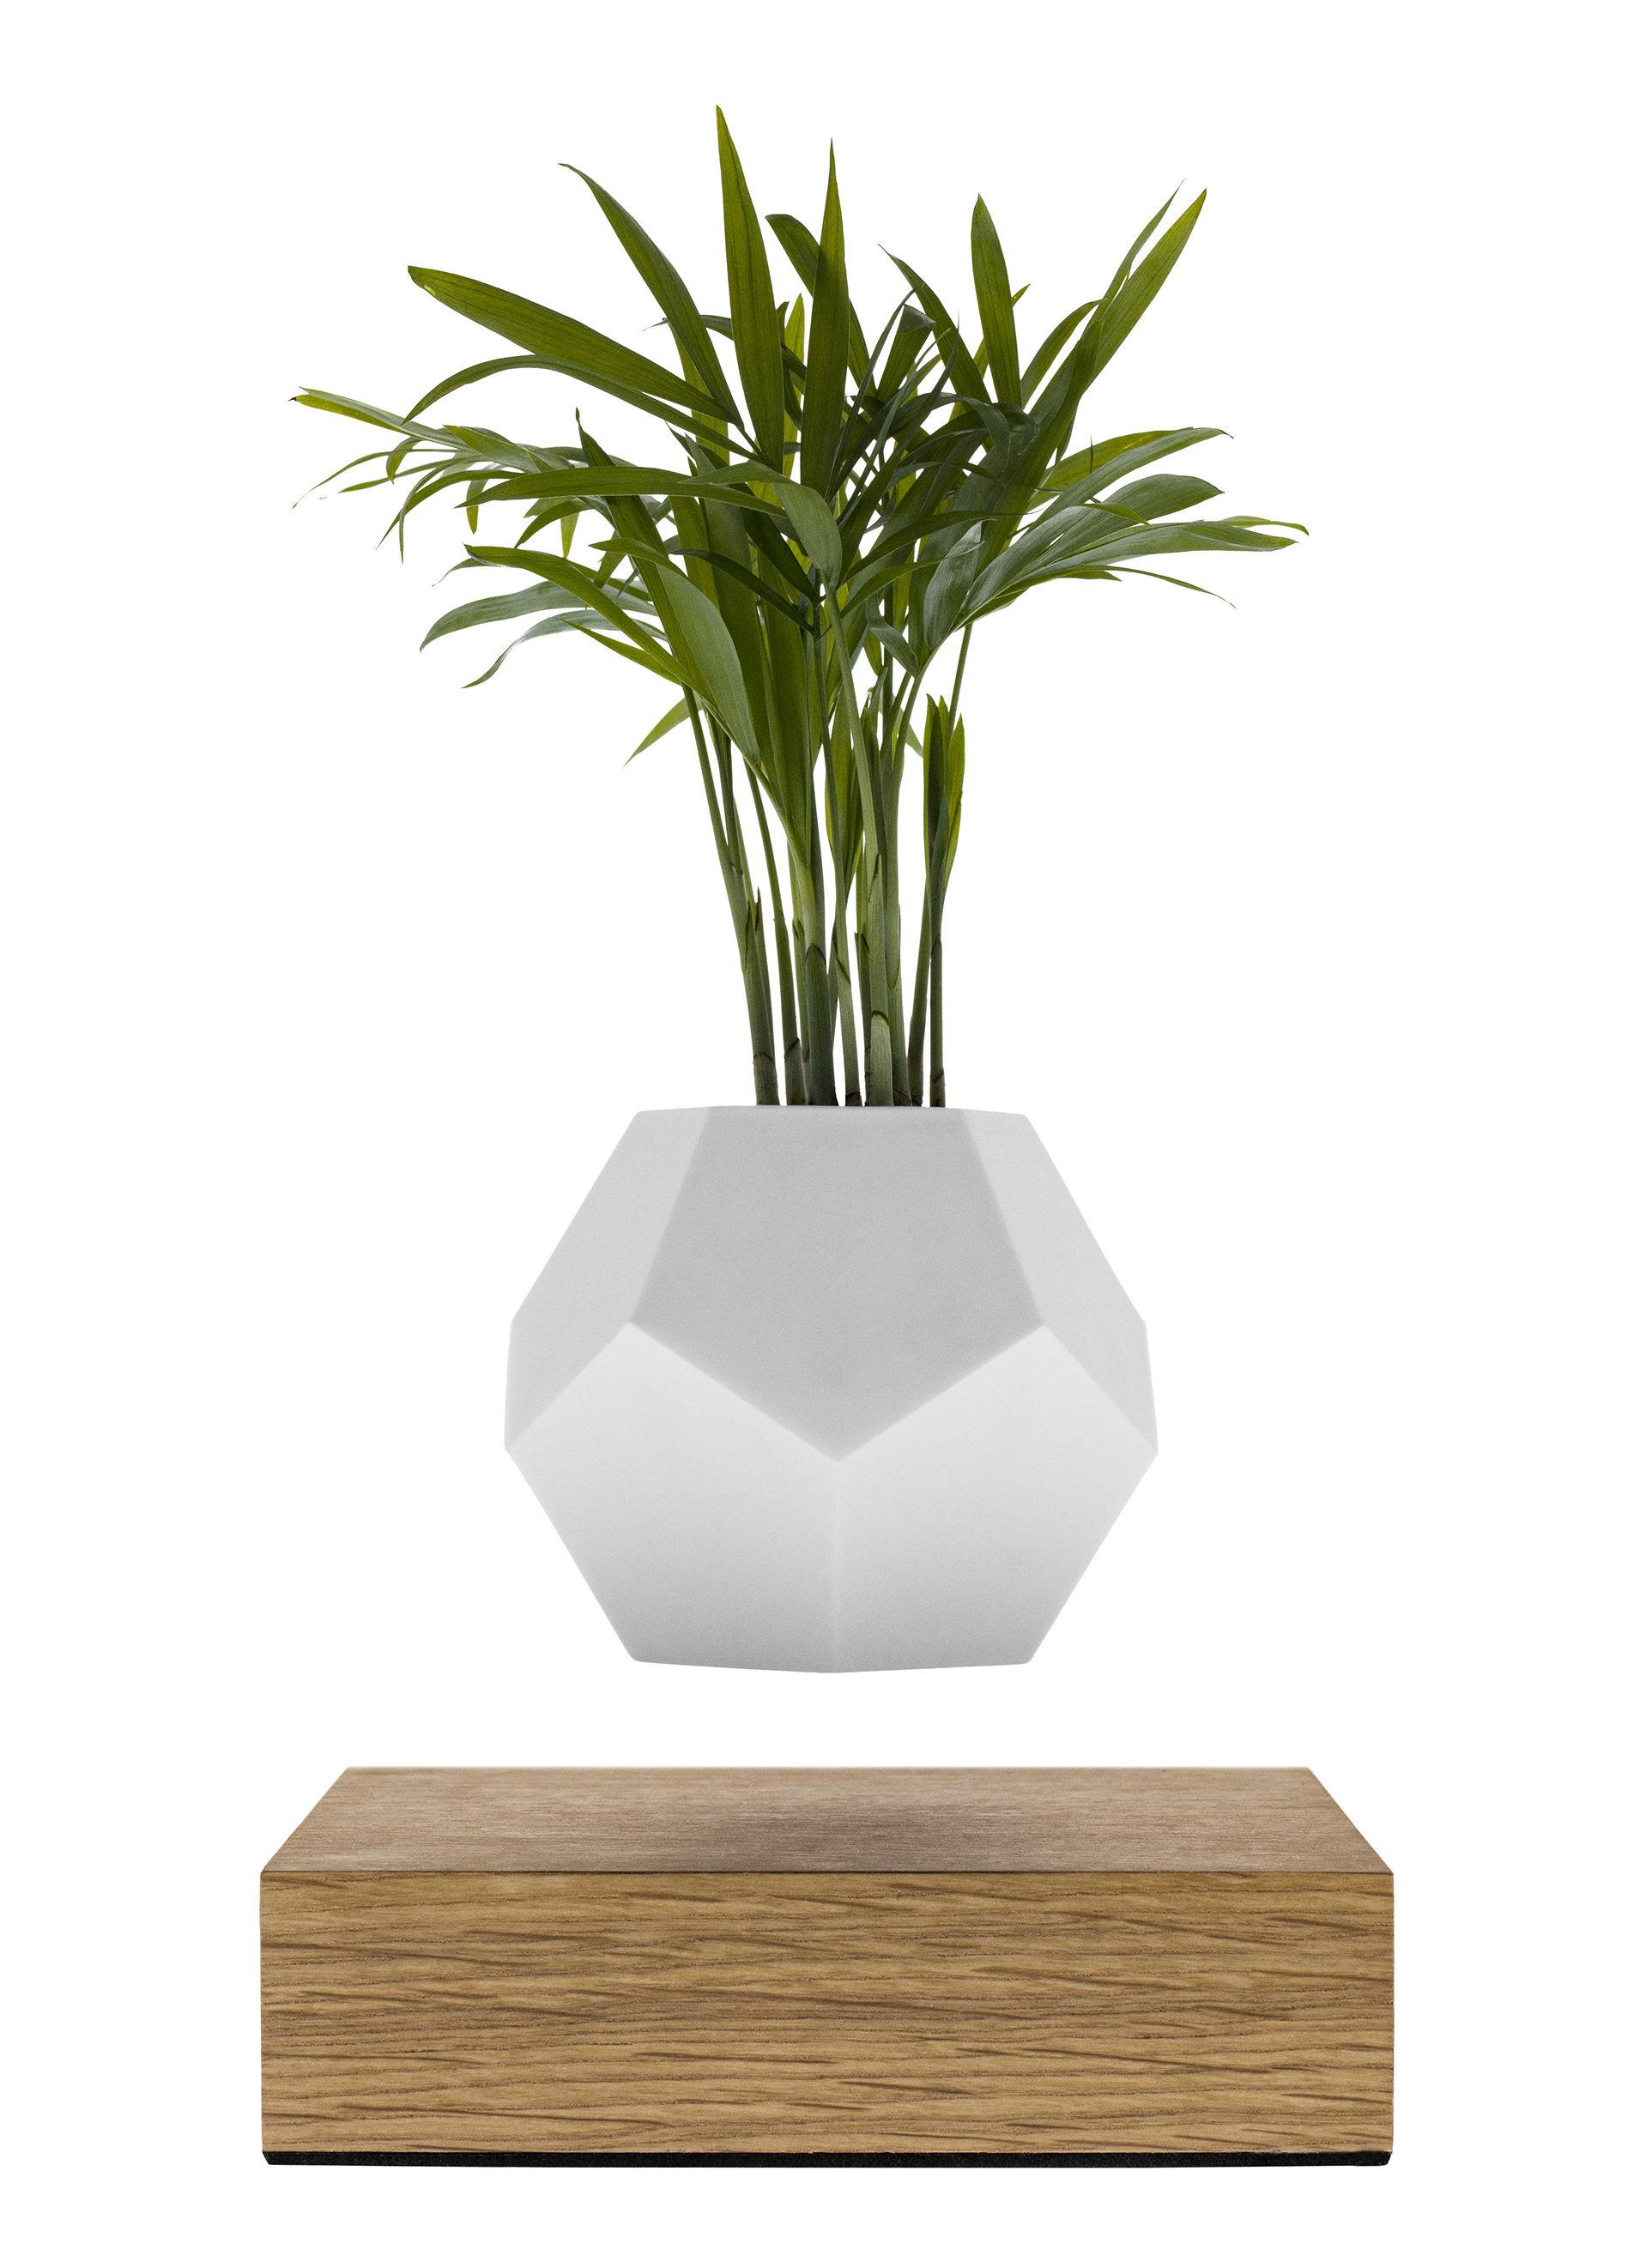 Decoration - Flower Pots & House Plants - Lyfe Flowerpot - / Levitating pot by Flyte - White / Oak base - Oak, Silicone